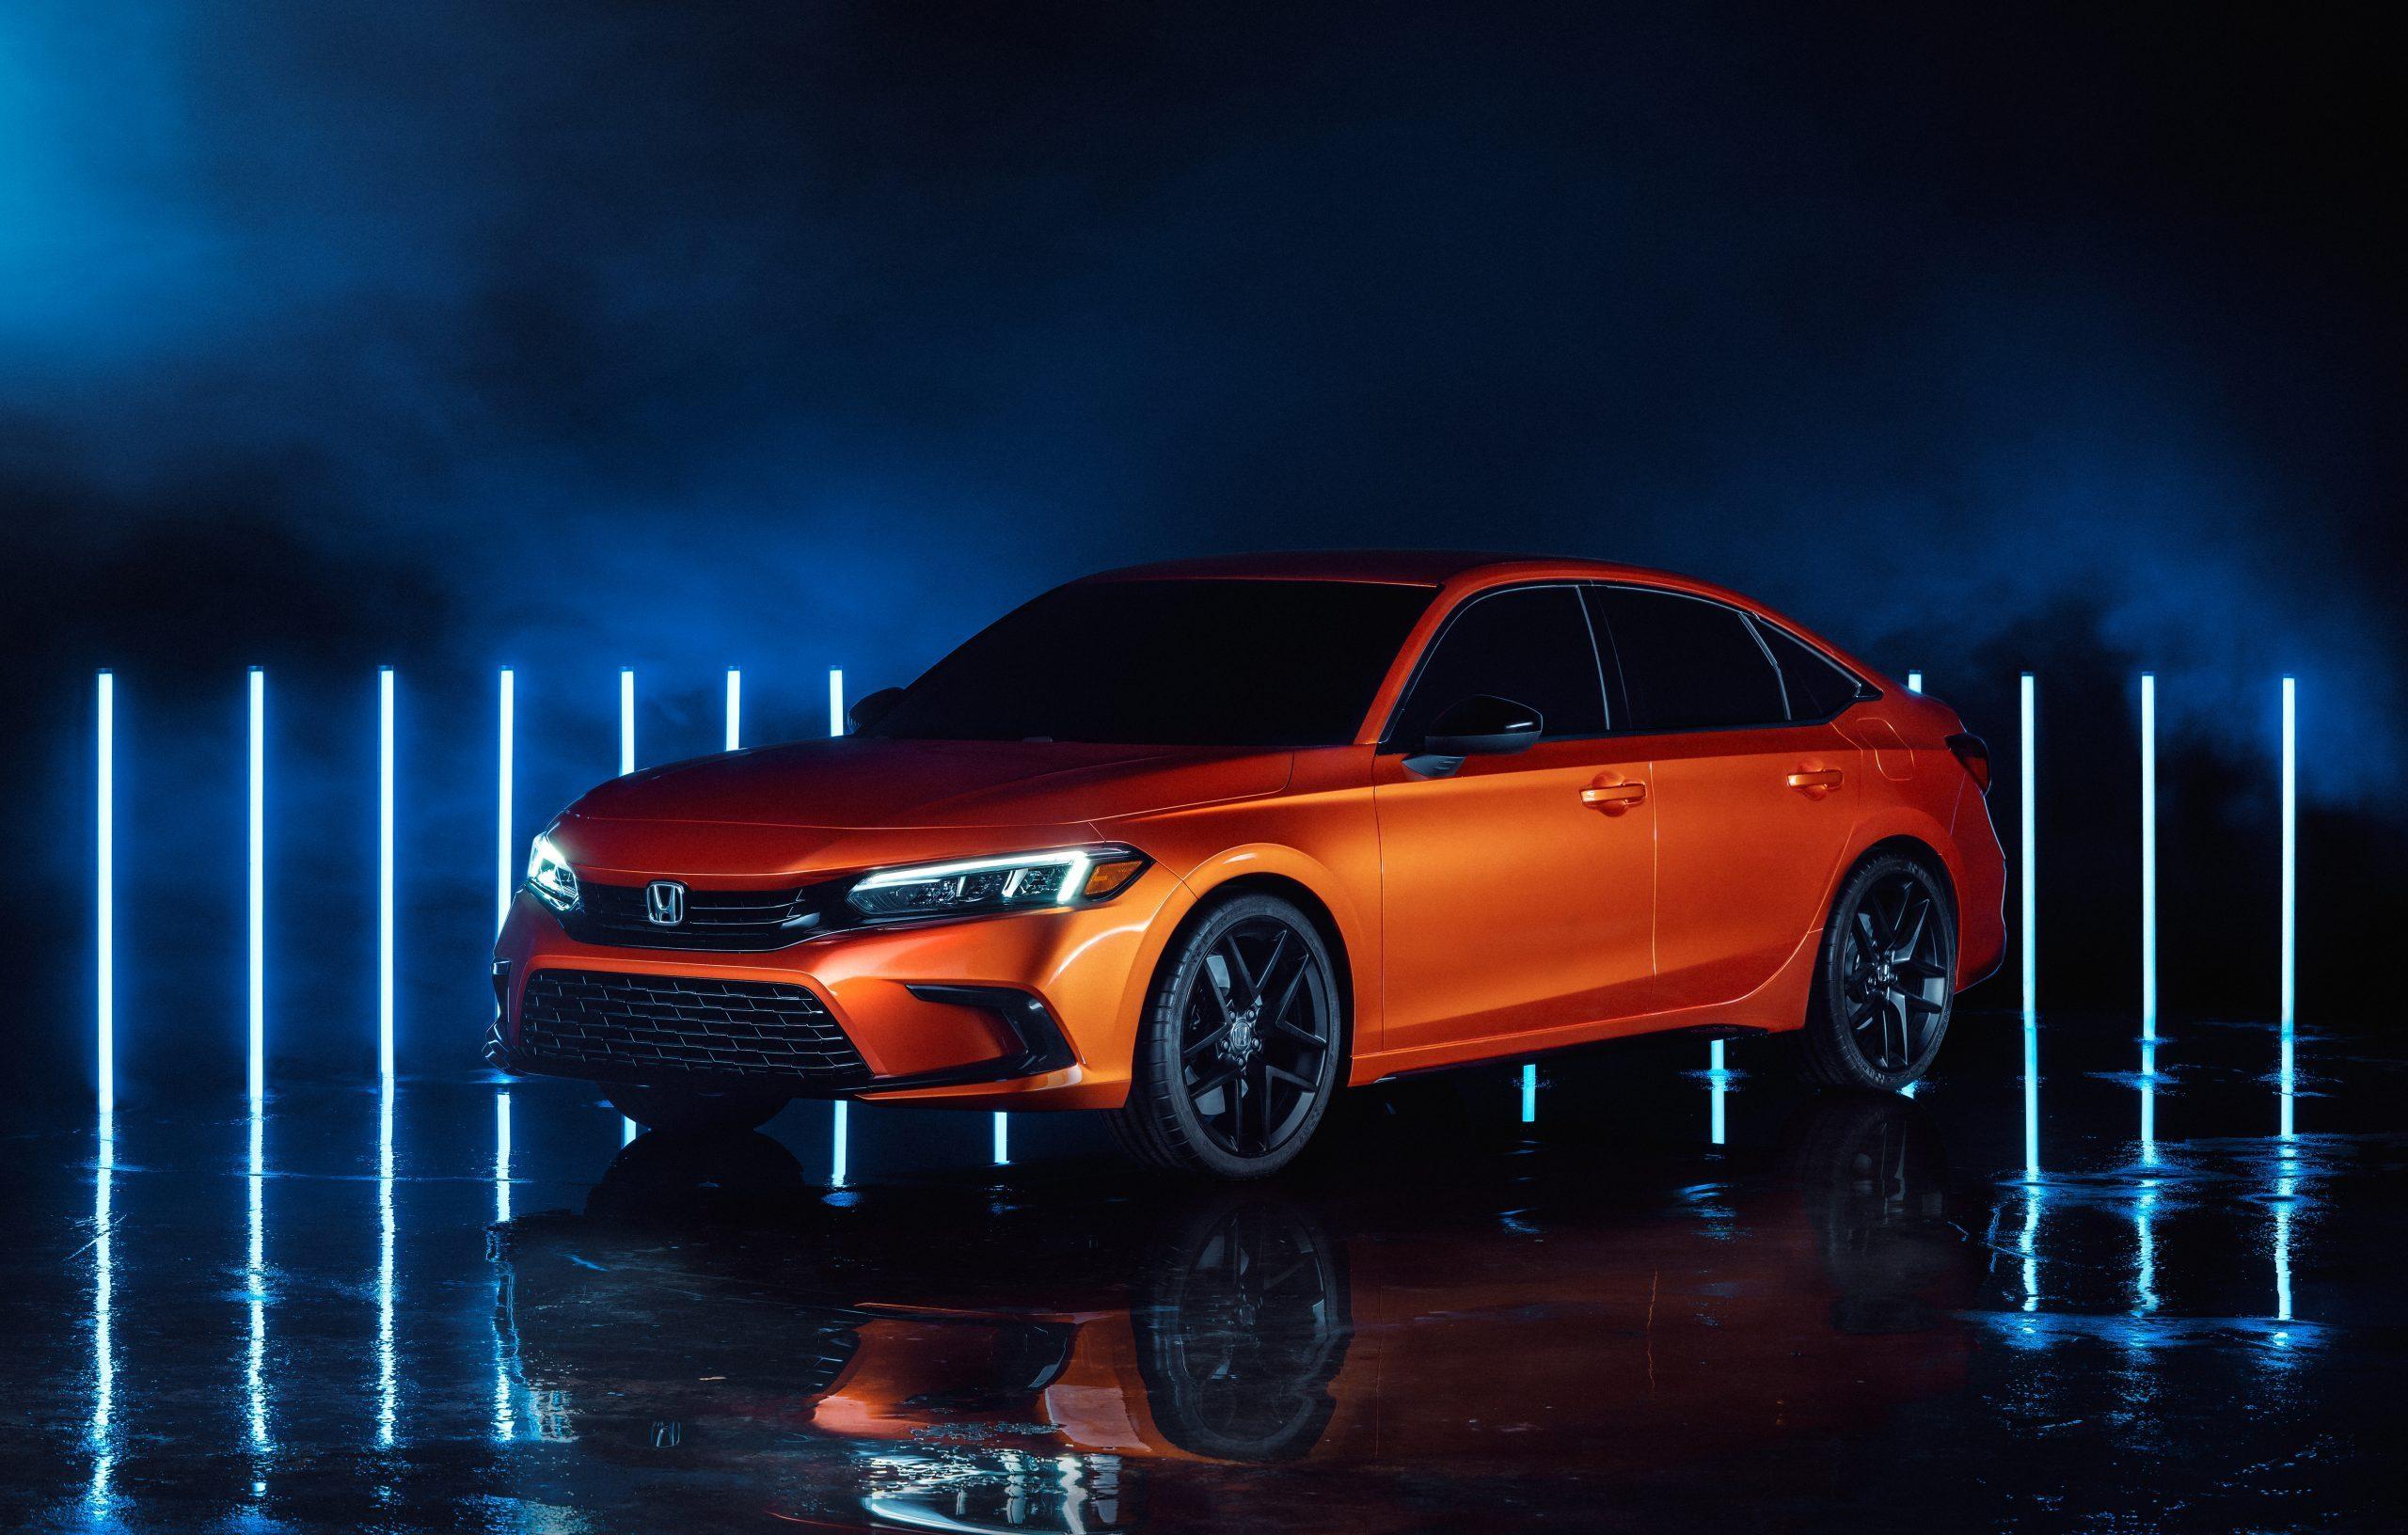 2022 Honda Civic Prototype front three quarter